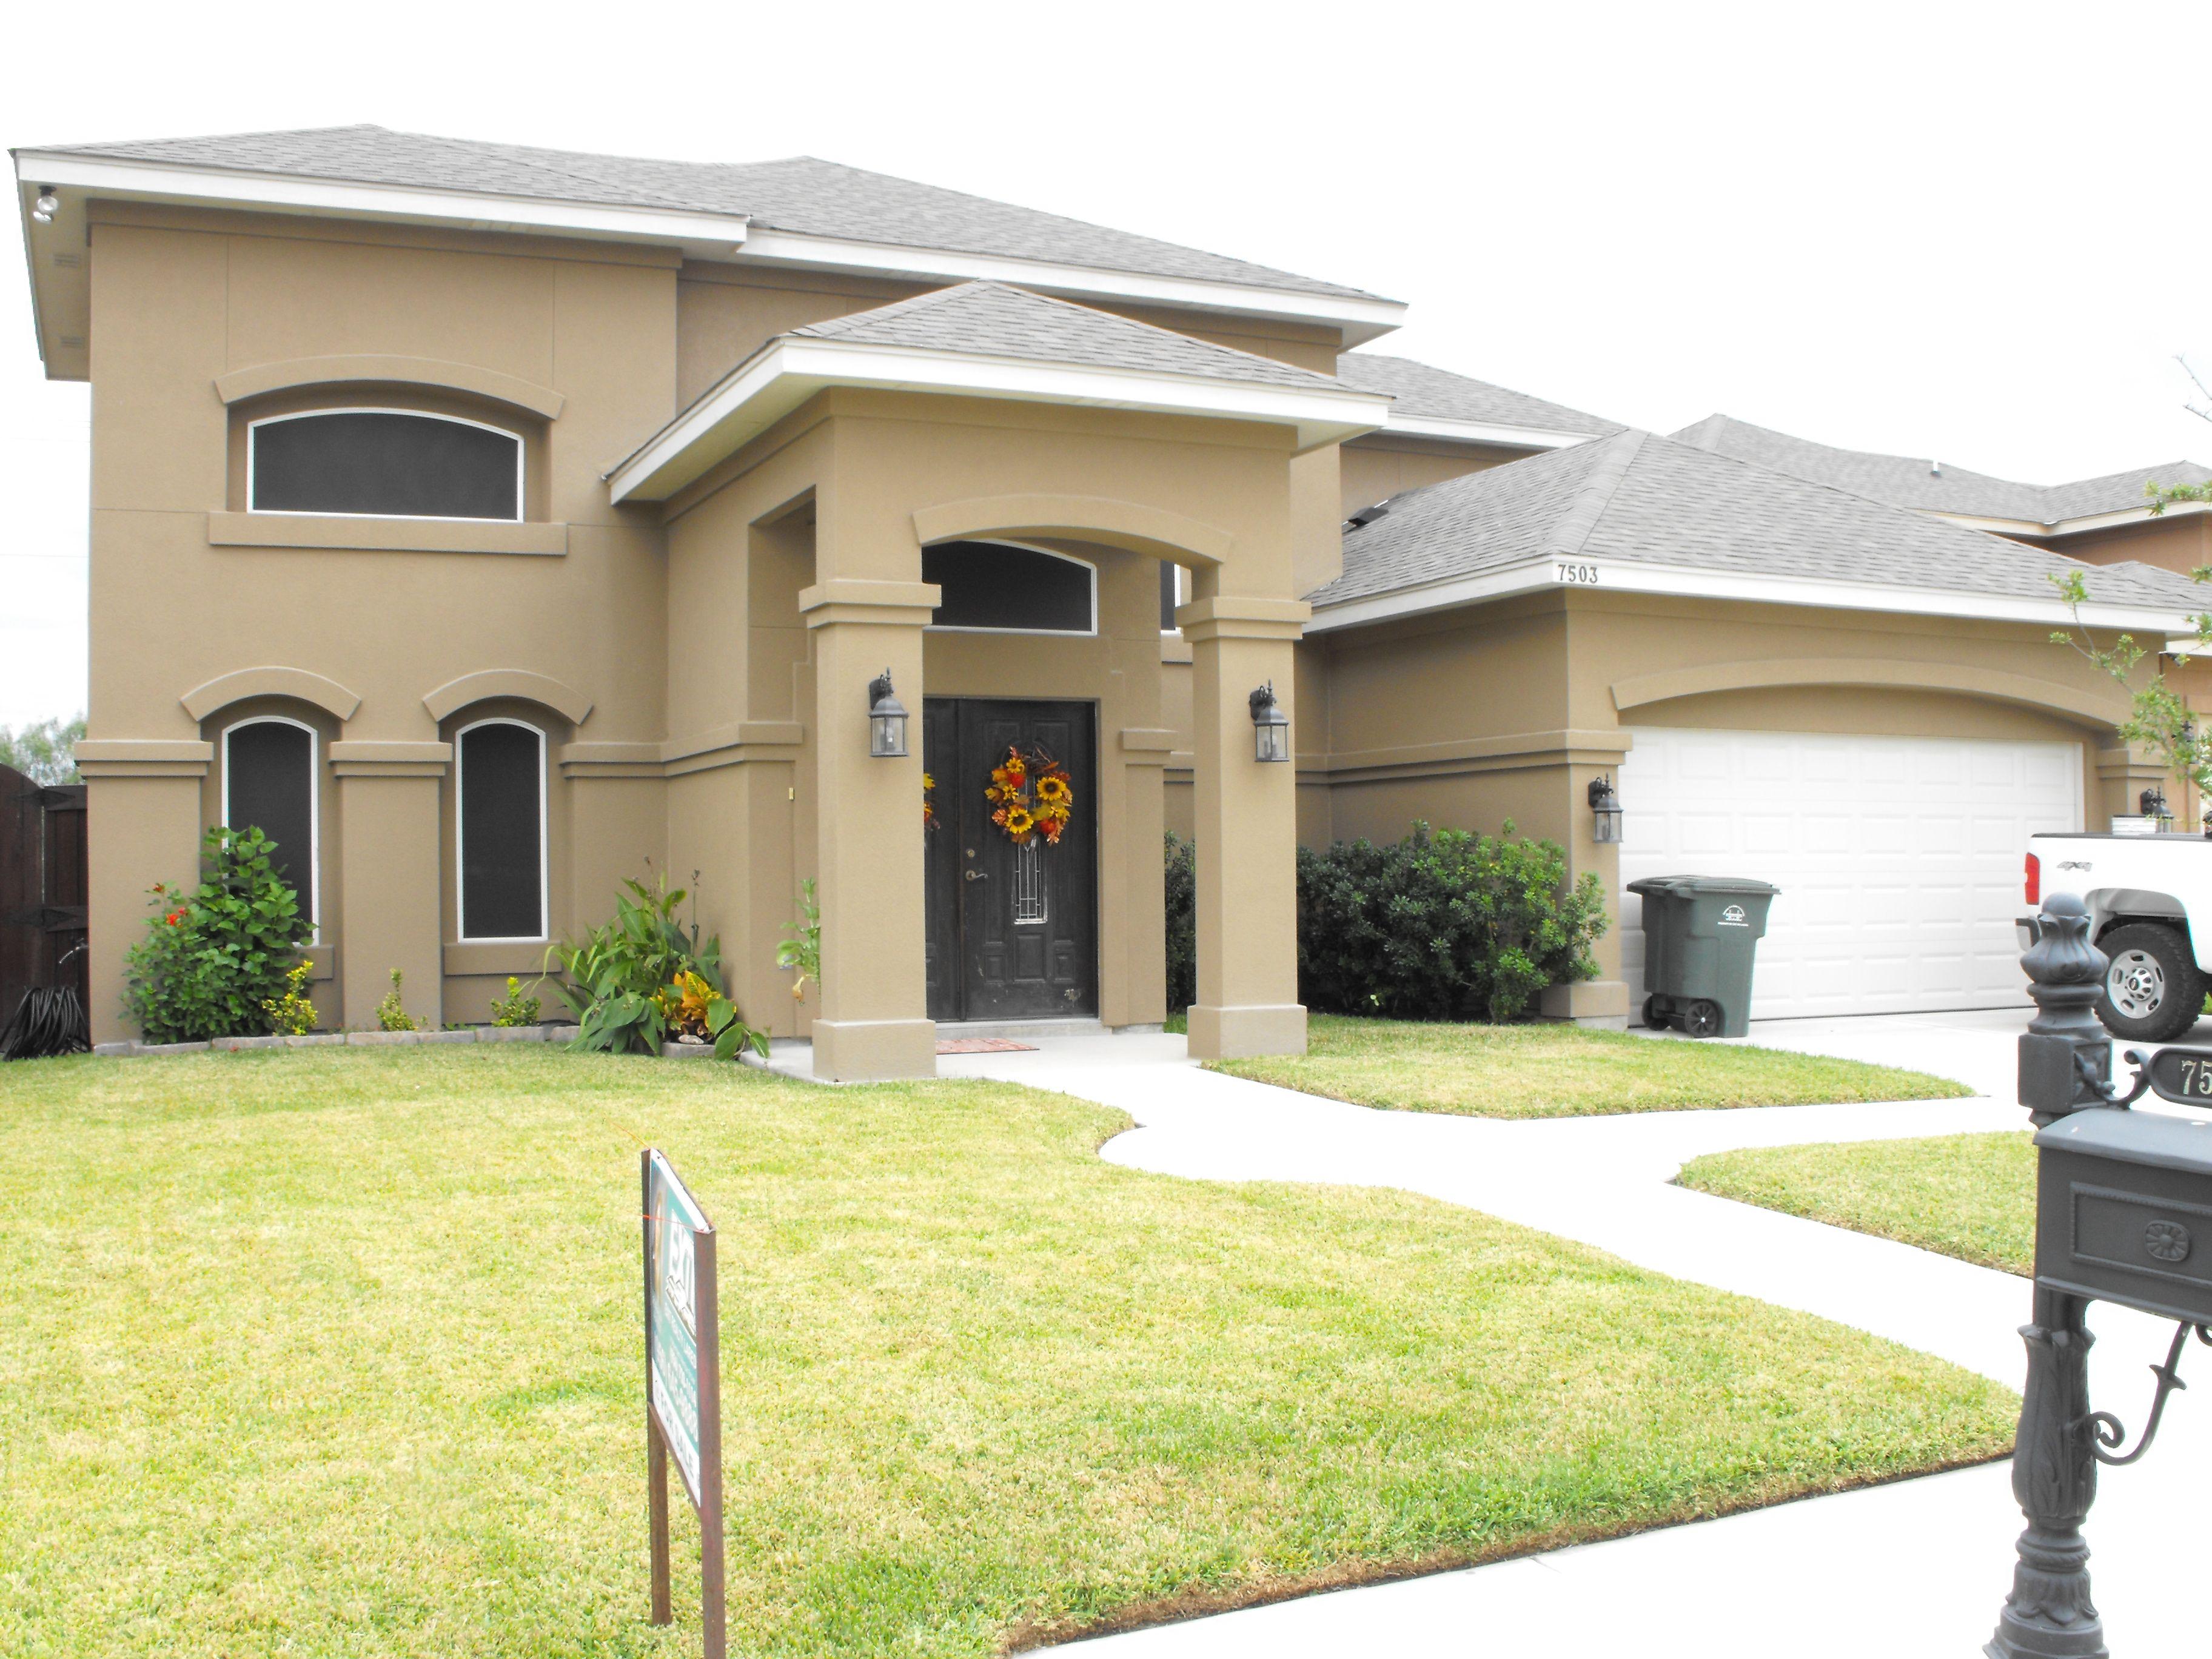 7305 Alejandra Ct. Laredo, TX Nu-Vision Subdivision 3 bedrooms 2.5 baths 2 car garage 20 ft entrance $229,900